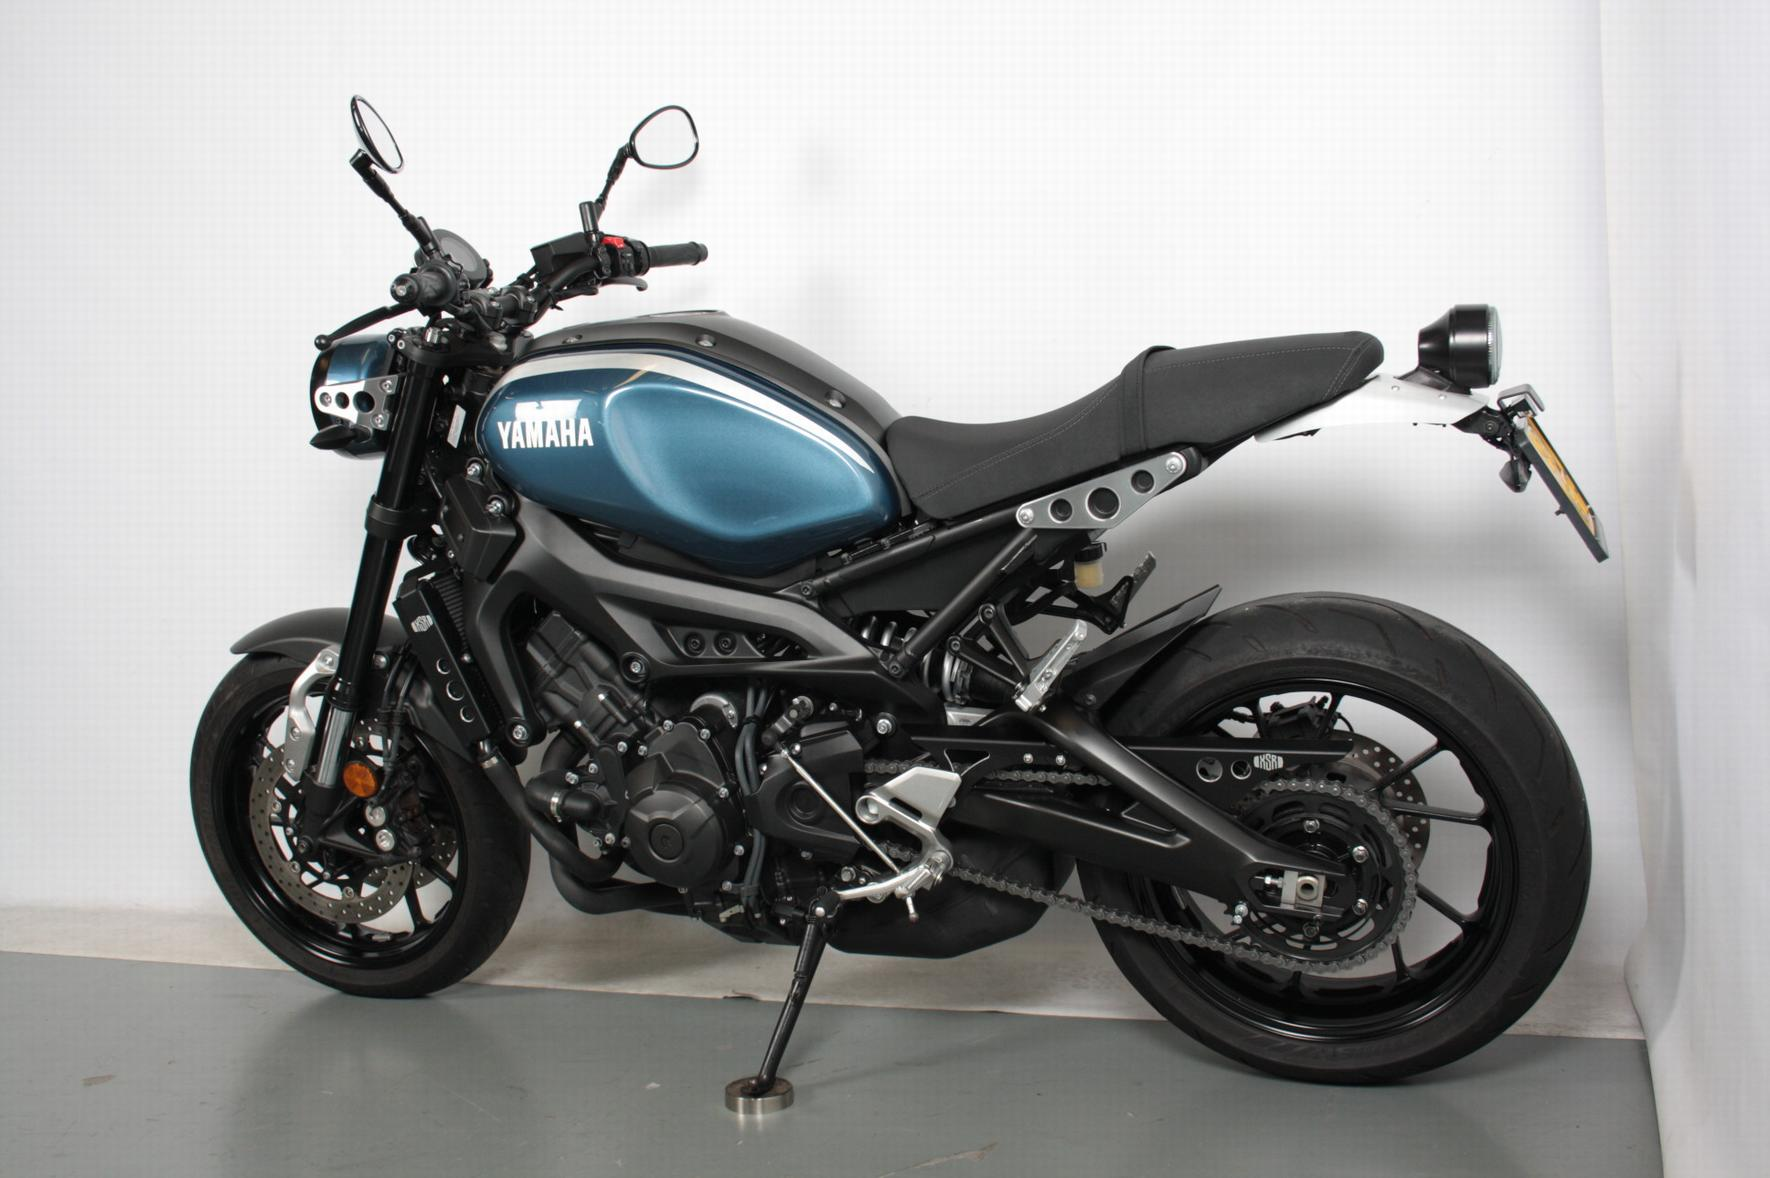 YAMAHA - XSR900 ABS